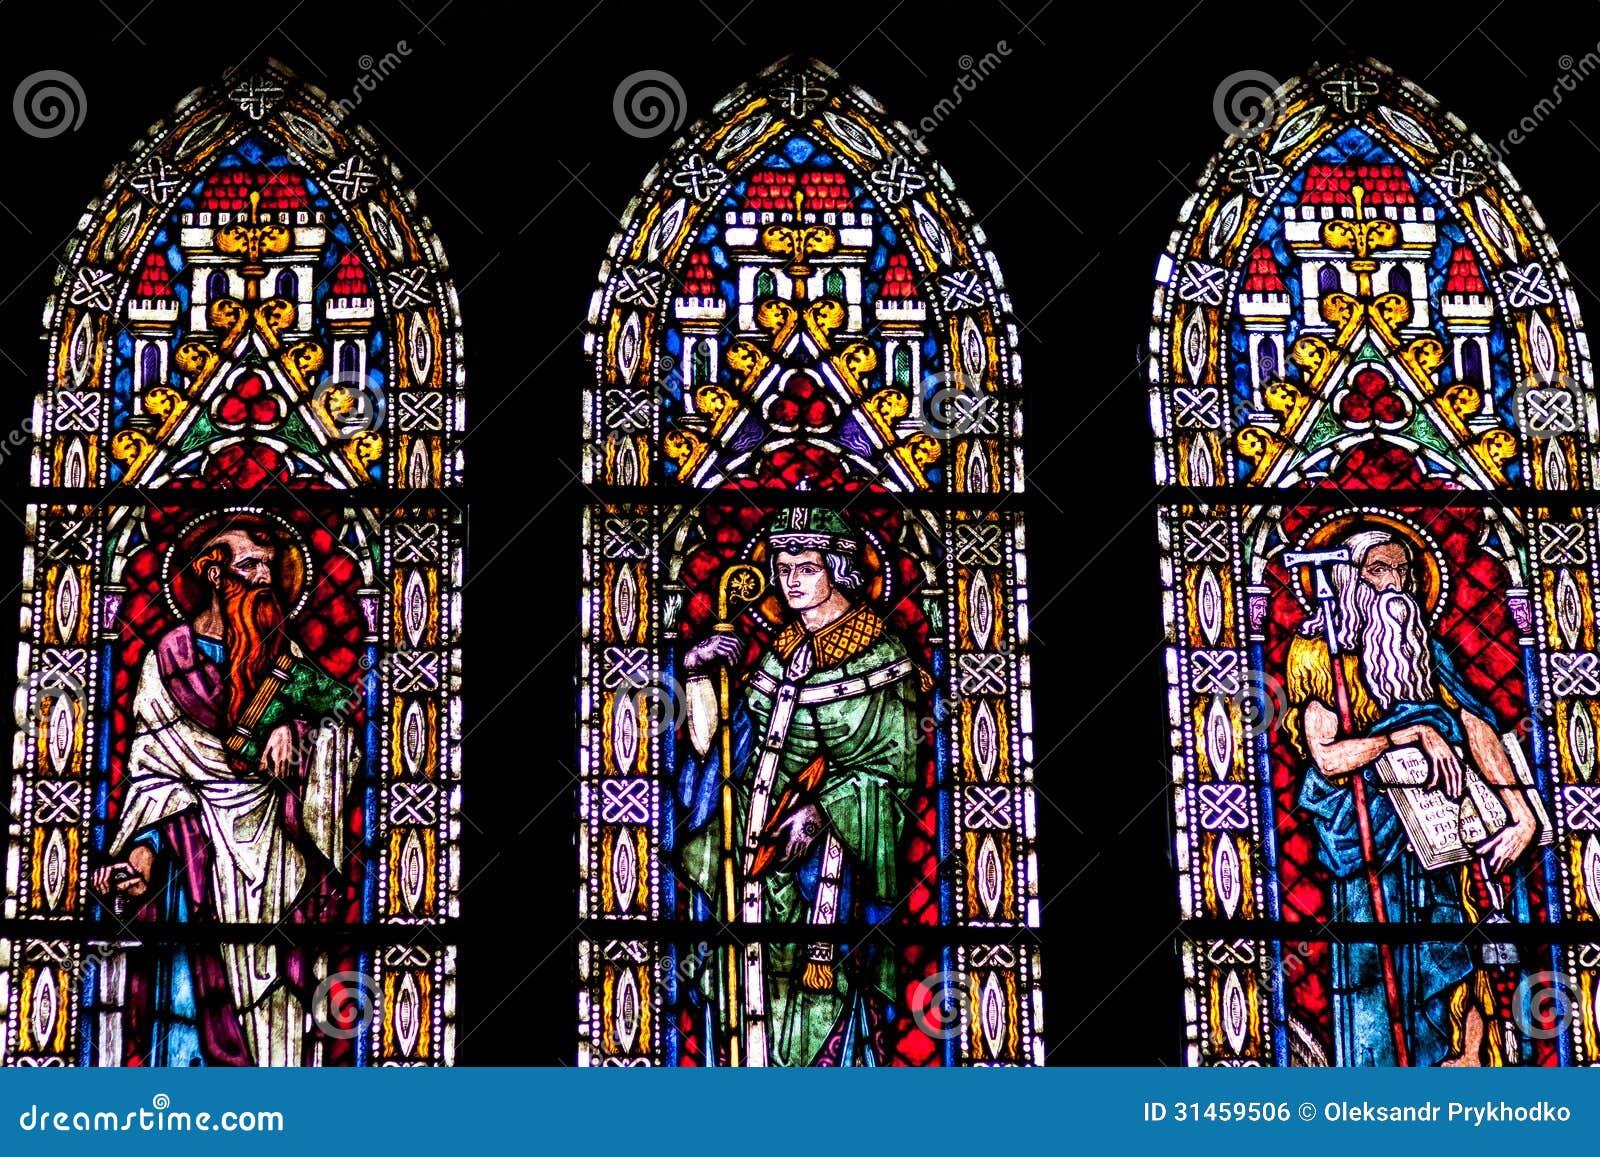 City Glass Windows : Stained glass windows of freiburg minster stock photo